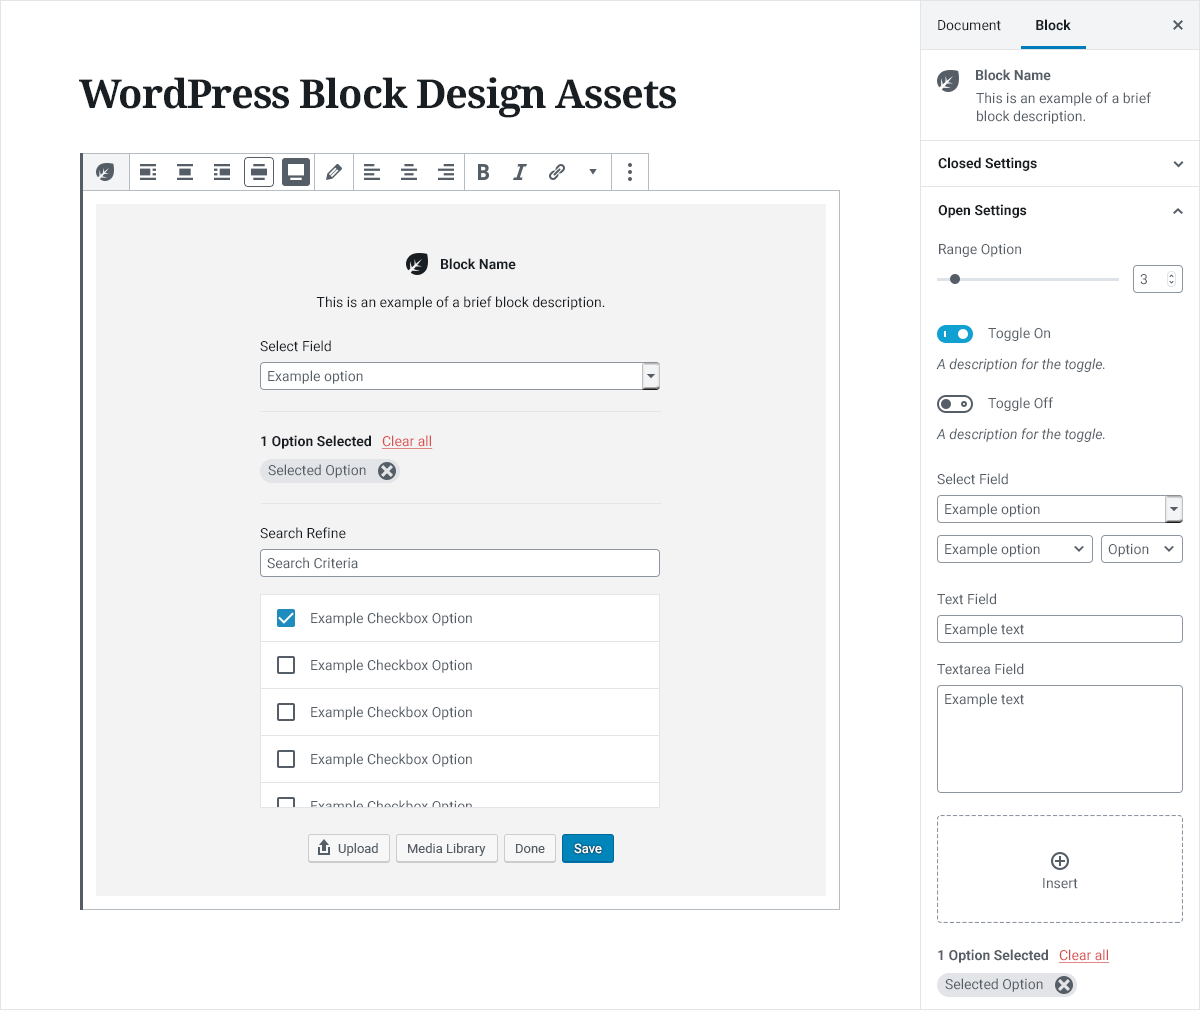 Block Design Assets